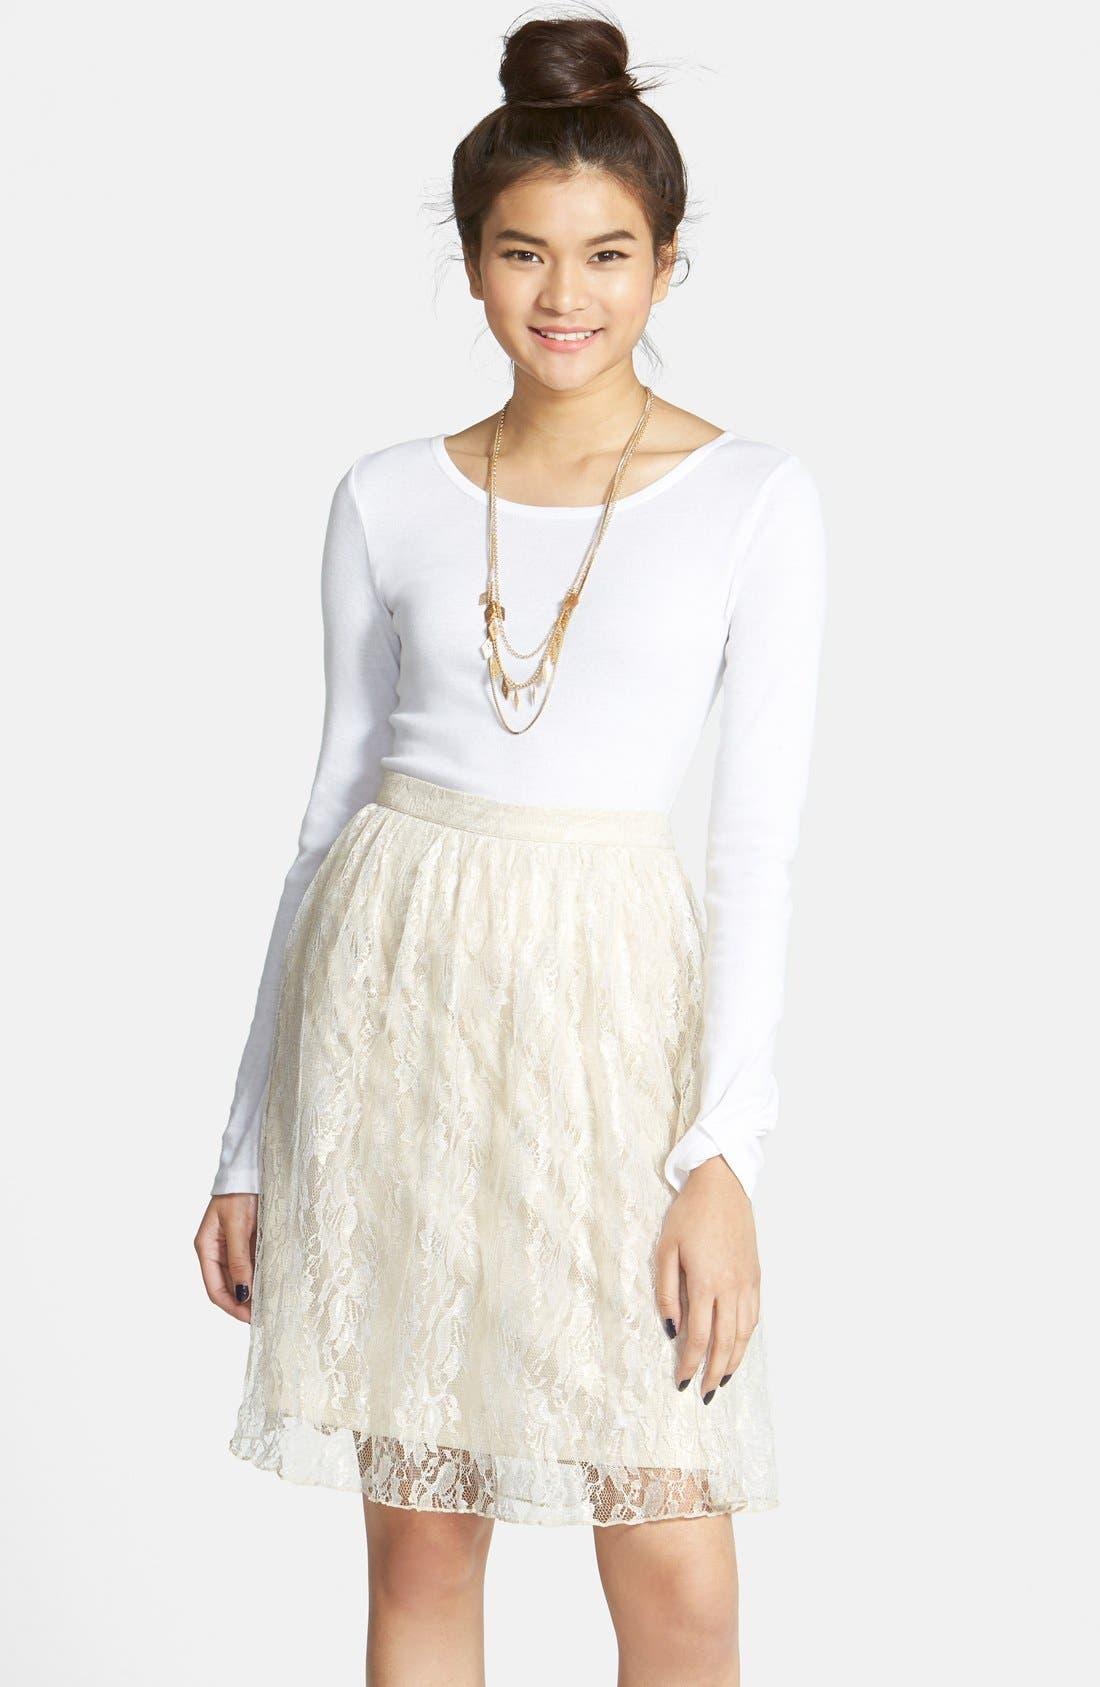 Alternate Image 1 Selected - Frenchi® 'Lace Shine' Midi Skirt (Juniors)